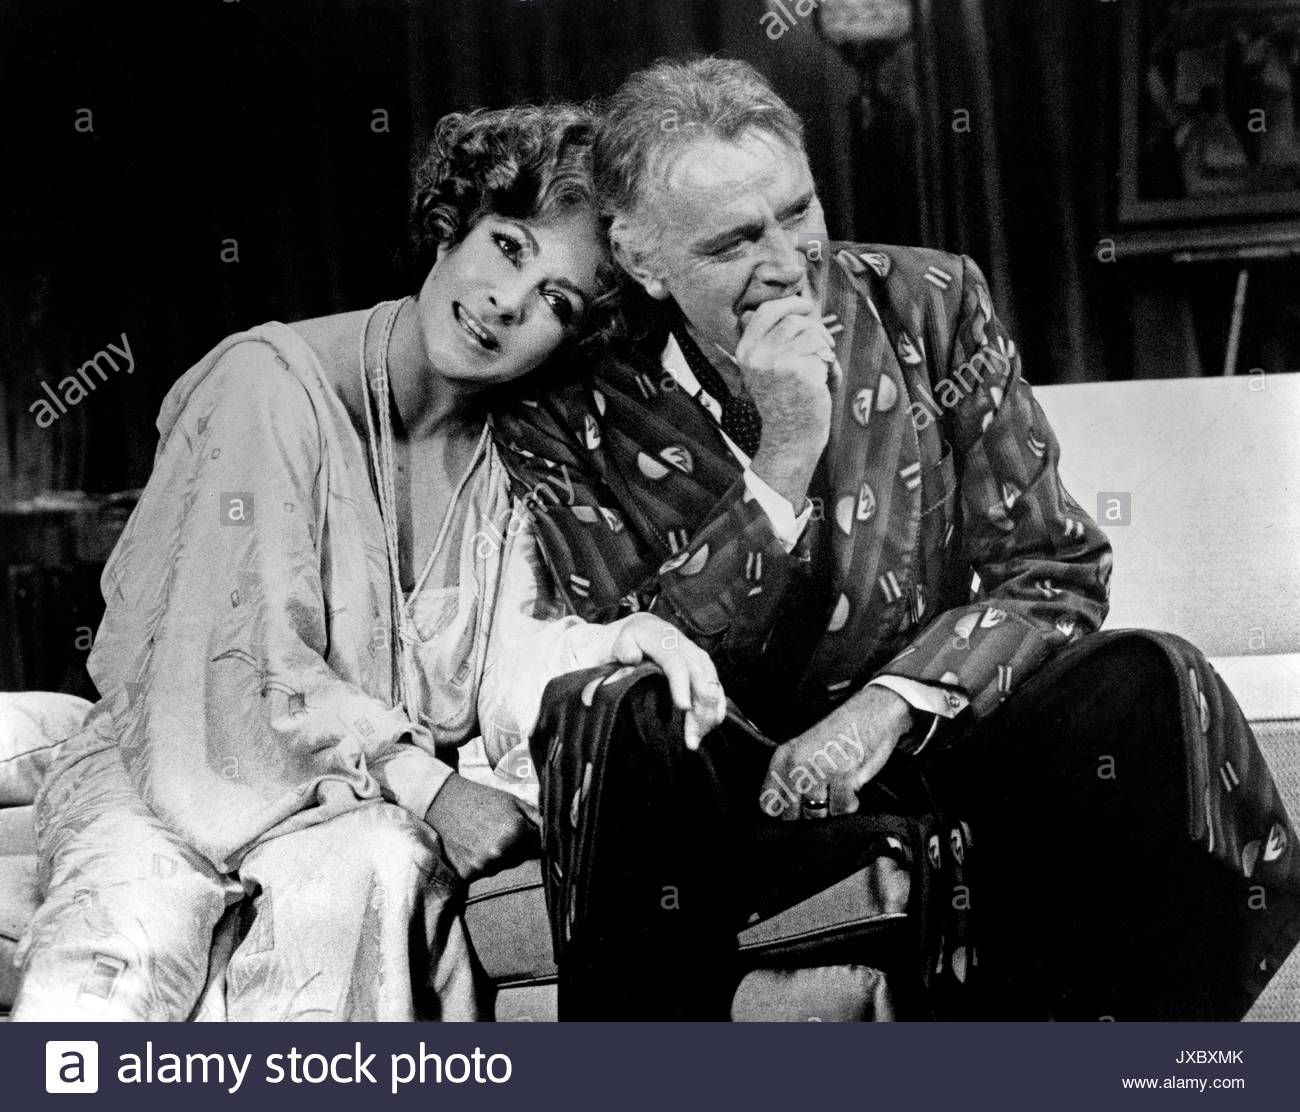 Download This Stock Image Private Lives Theaterstuck Nach Noel Coward Usa 1980 Regie Mi Elizabeth Taylor Burton And Taylor Richard Burton Elizabeth Taylor